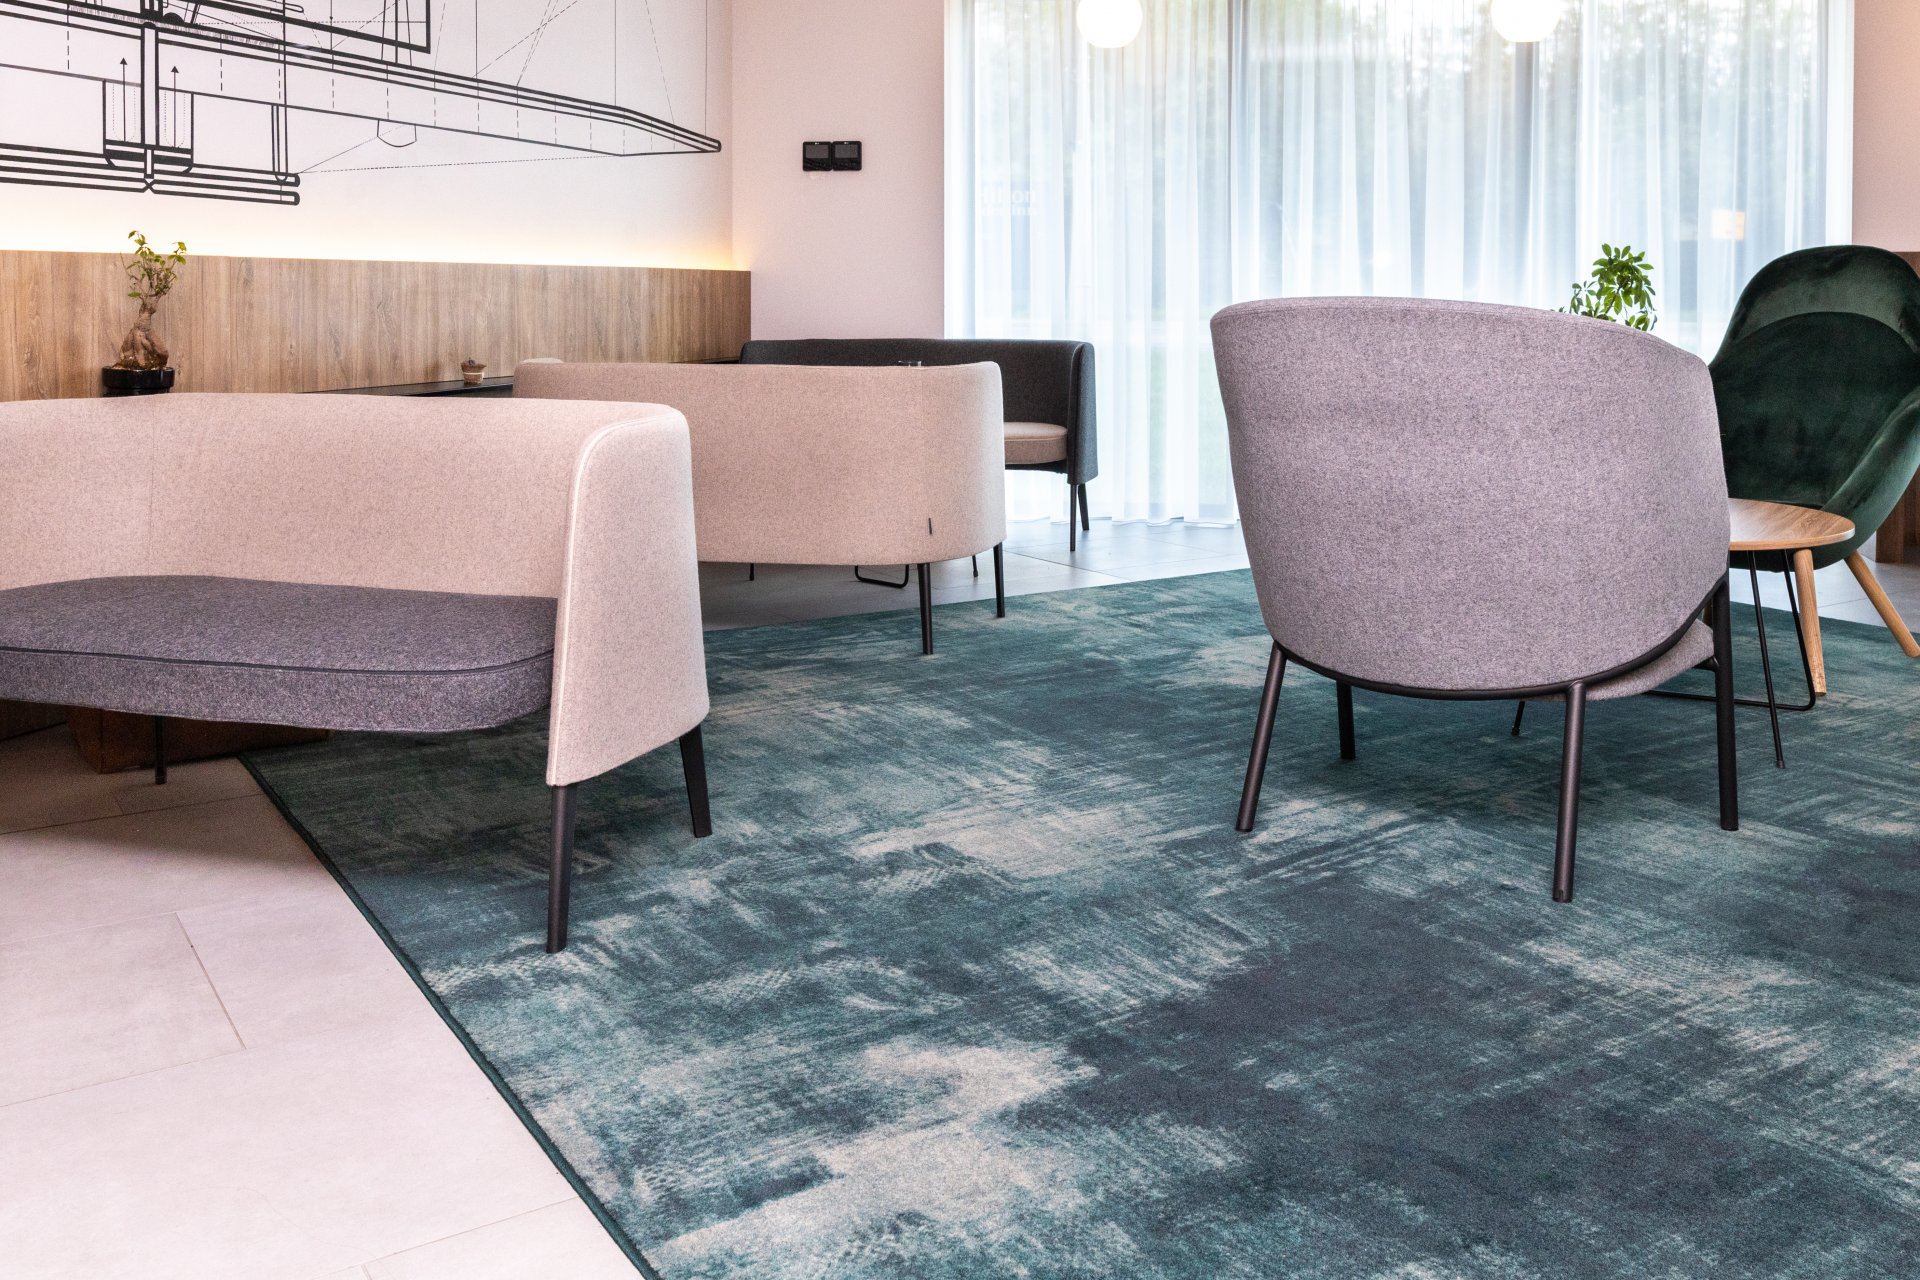 20200625-carpet-and-more-hilton-otopeni-34